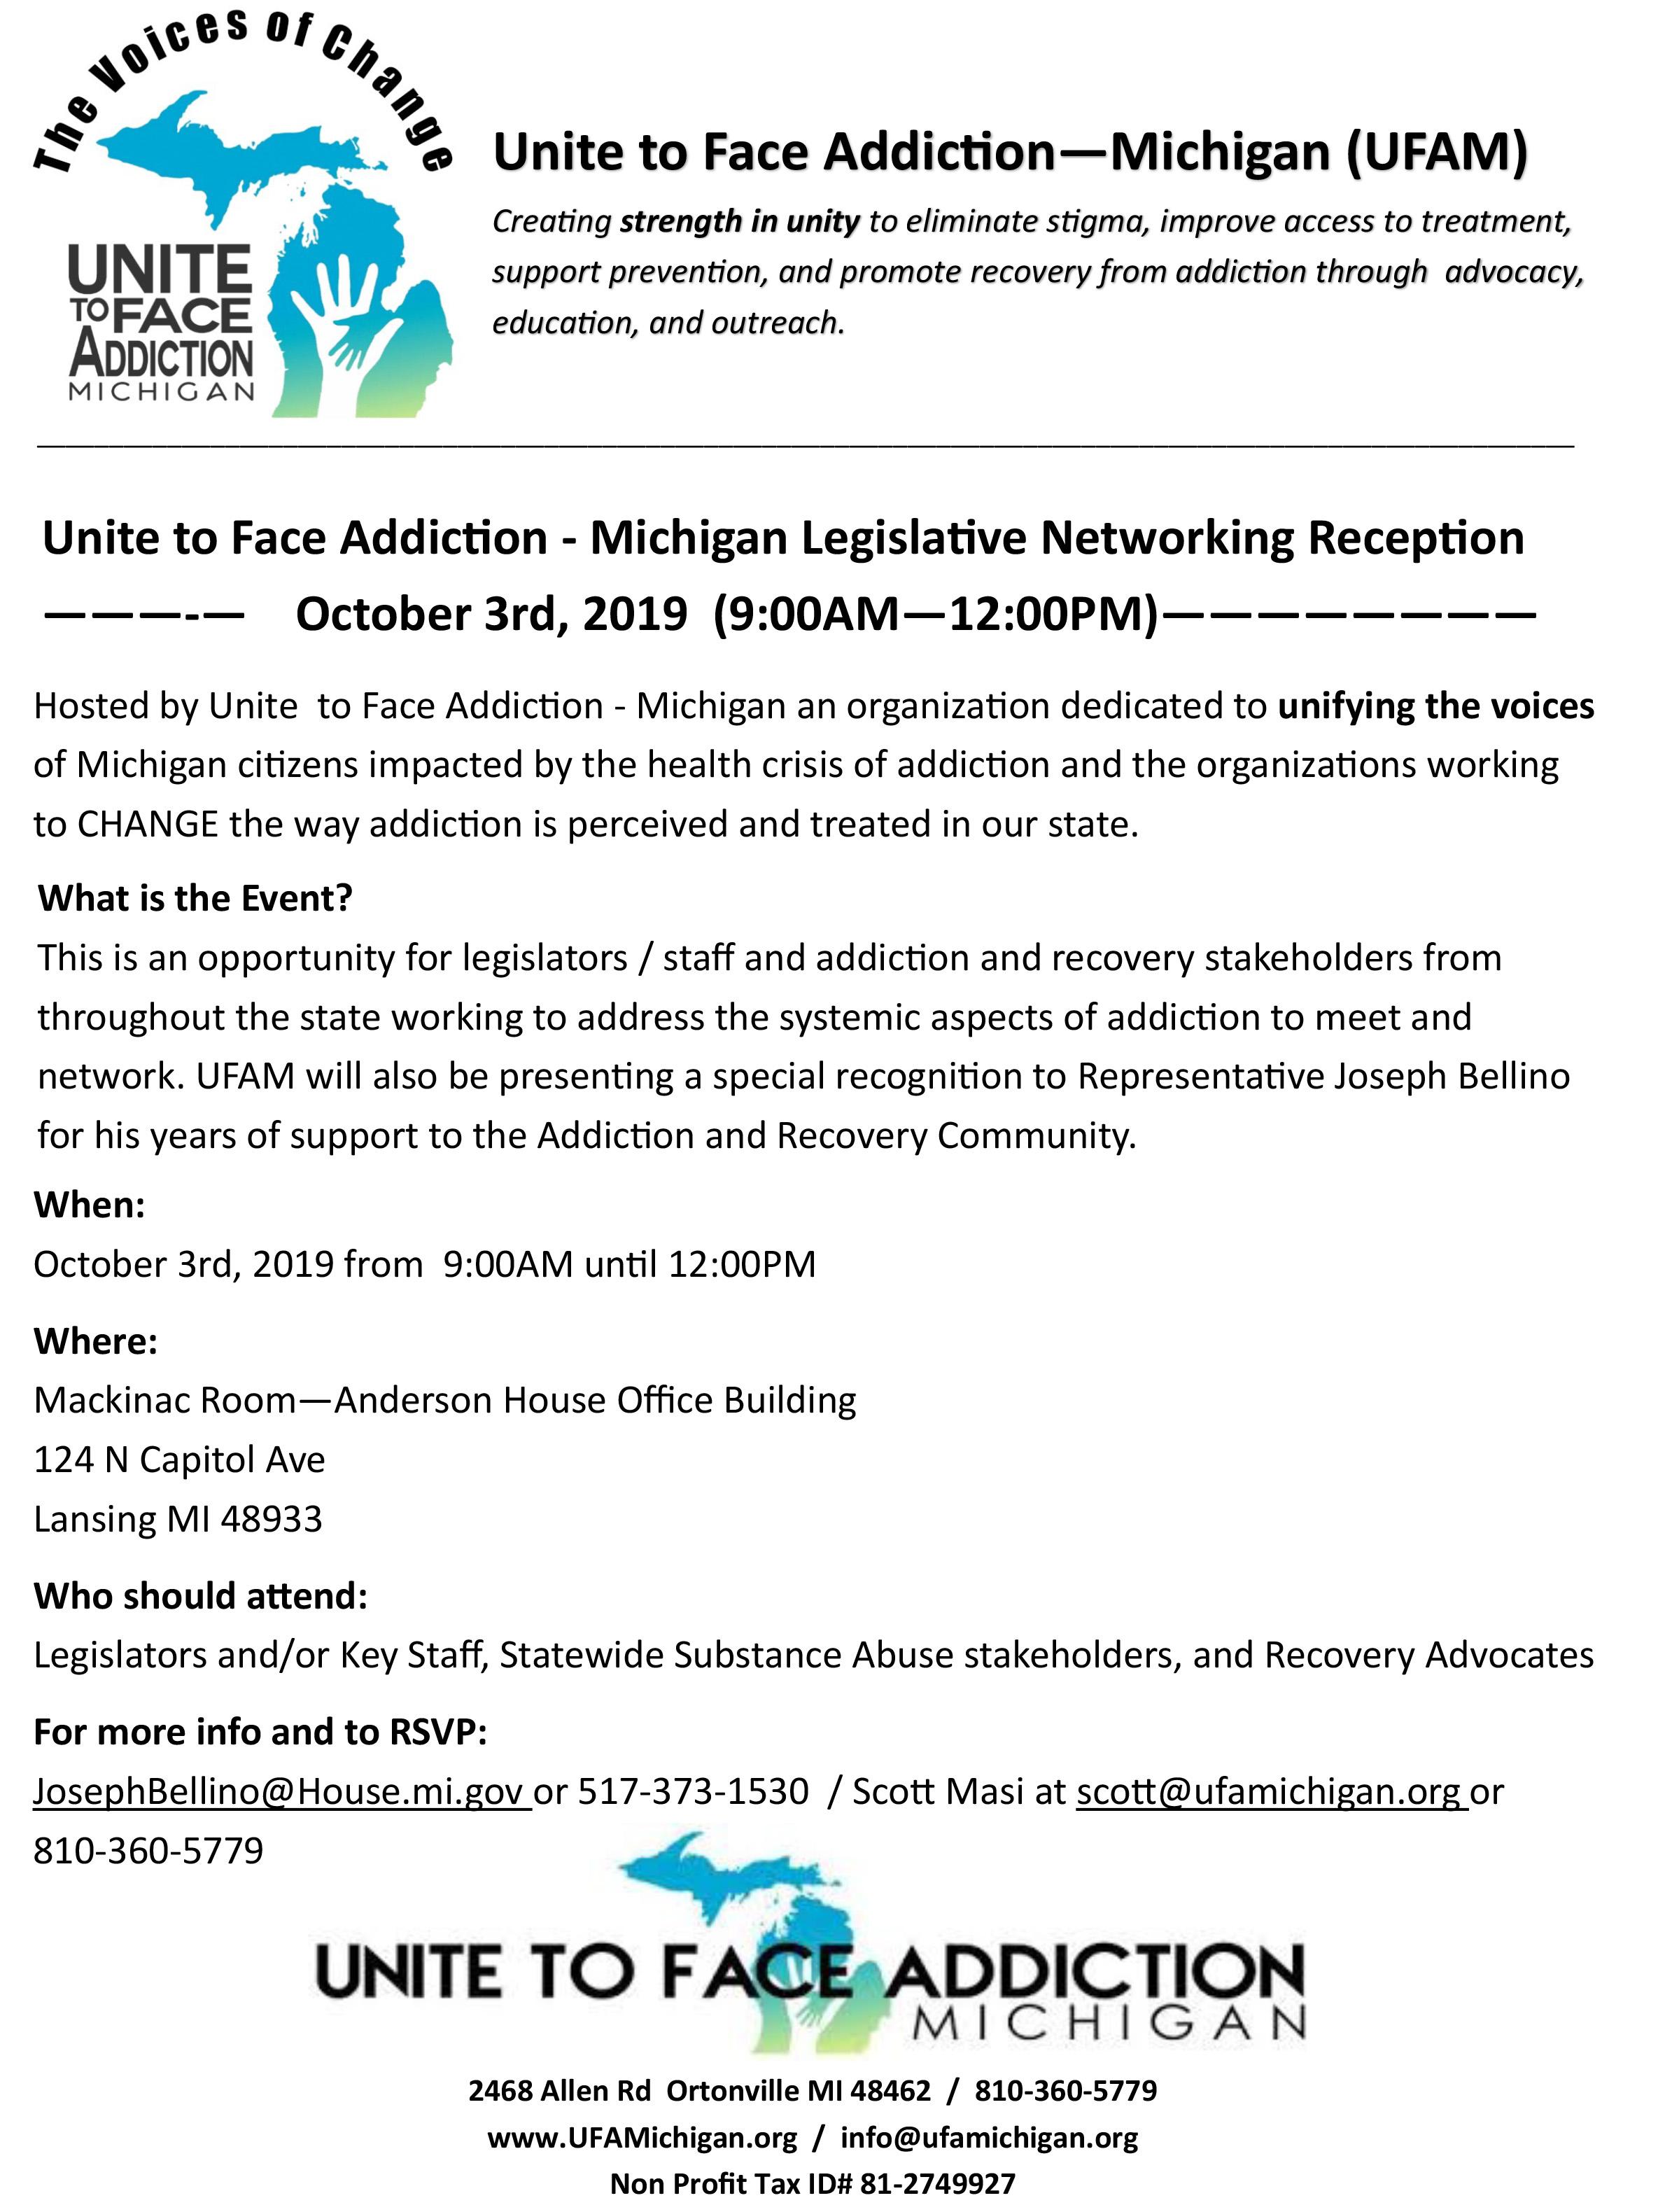 UFAM Leg Networking Oct 3